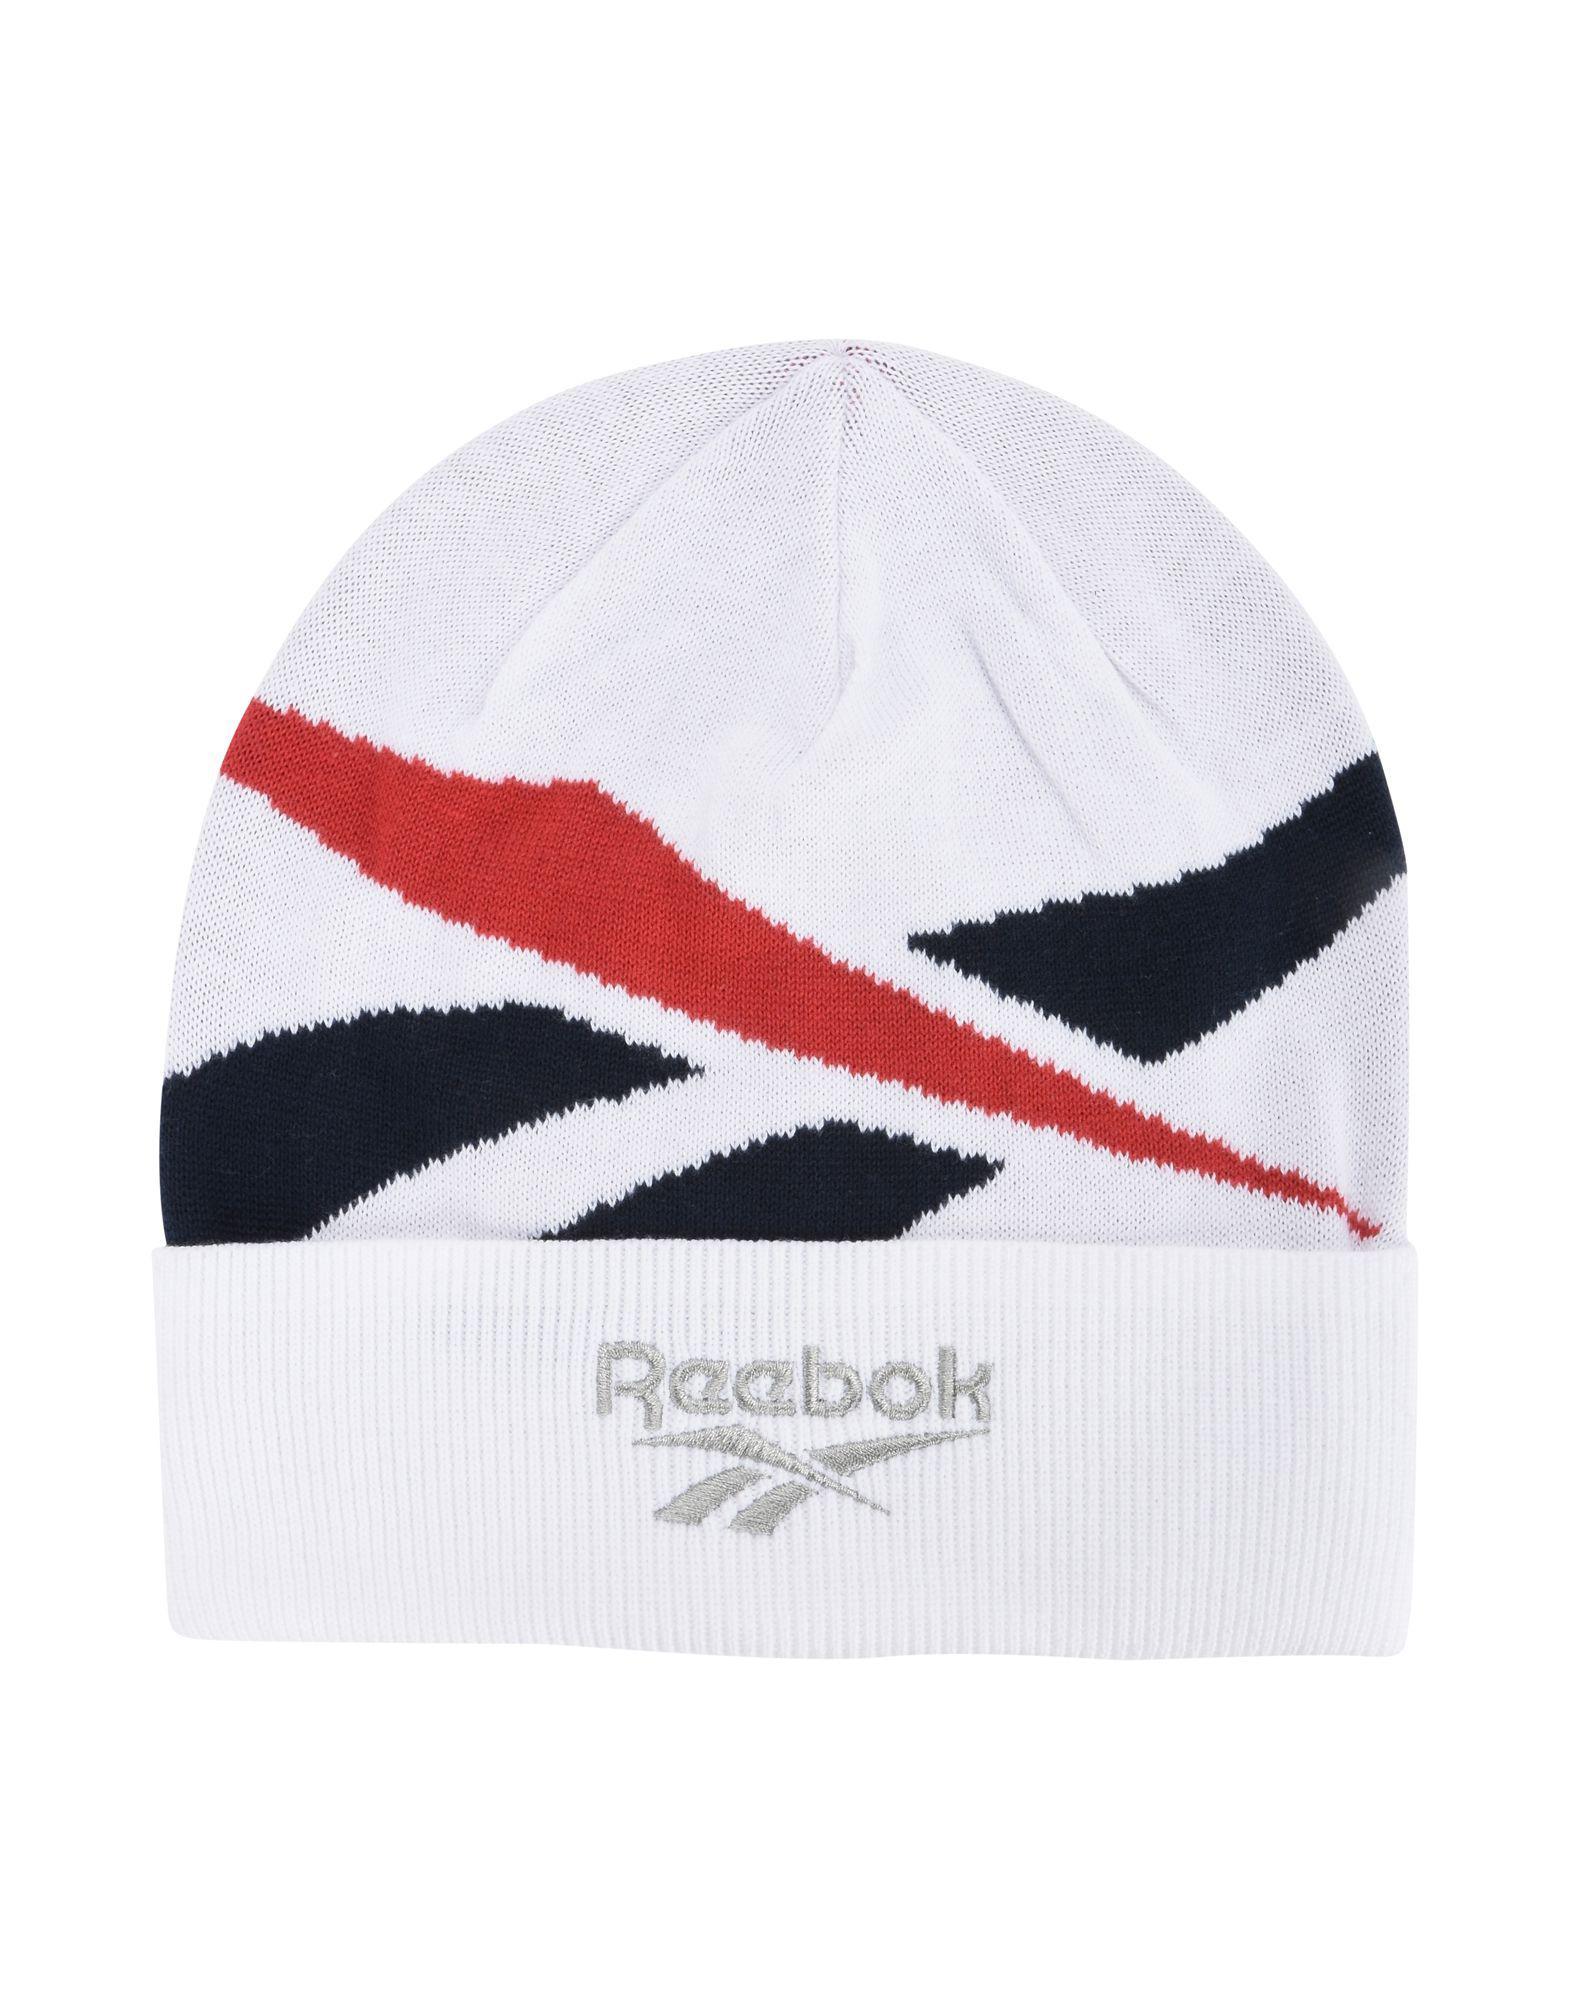 Reebok - White Hat - Lyst. View fullscreen 9cf28eec515